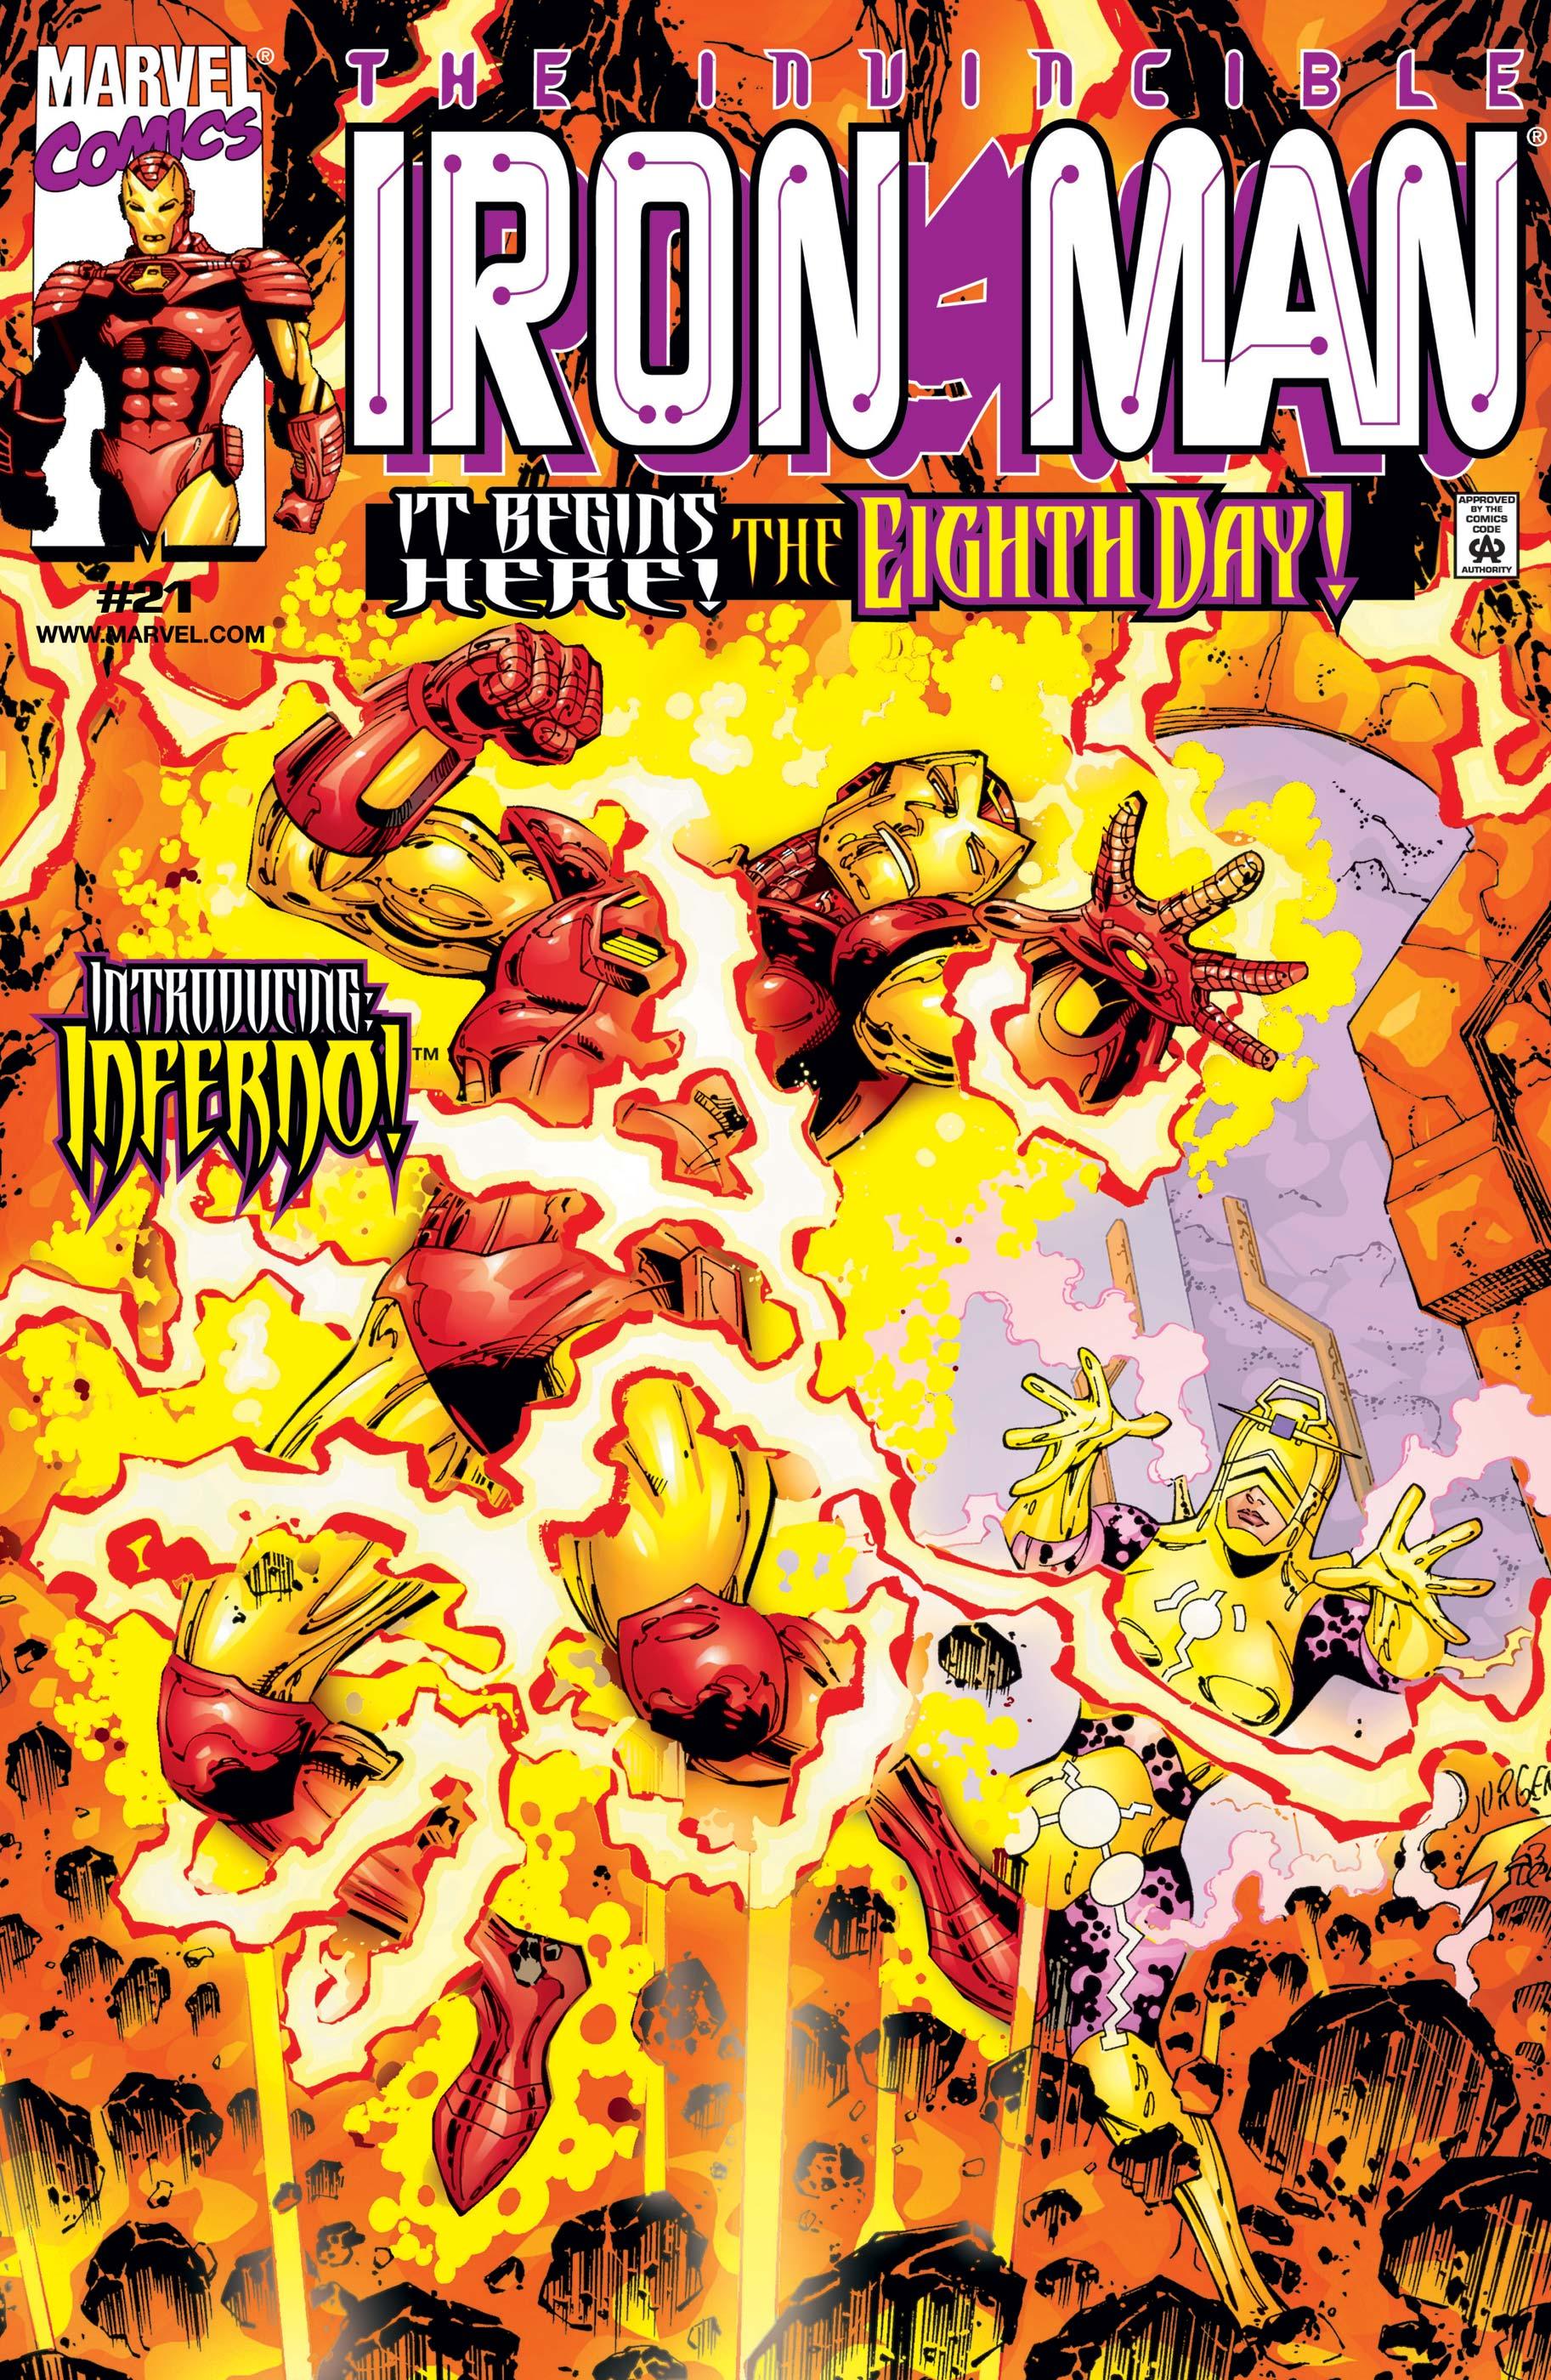 Iron Man (1998) #21